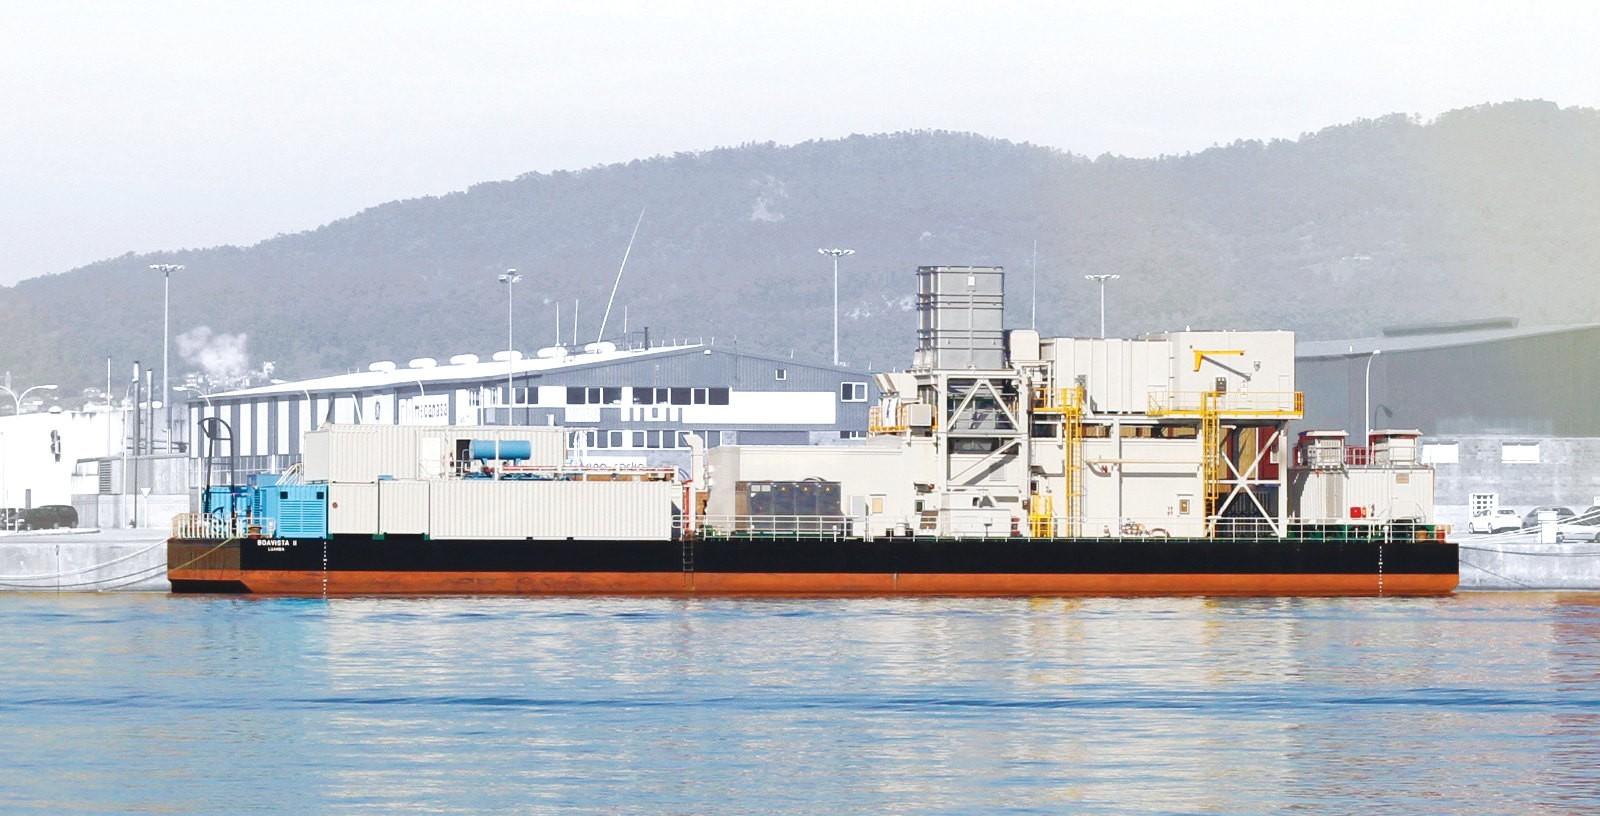 Floating_Electricity_Plant_Luanda_Angola_Cueto_IDOM_01